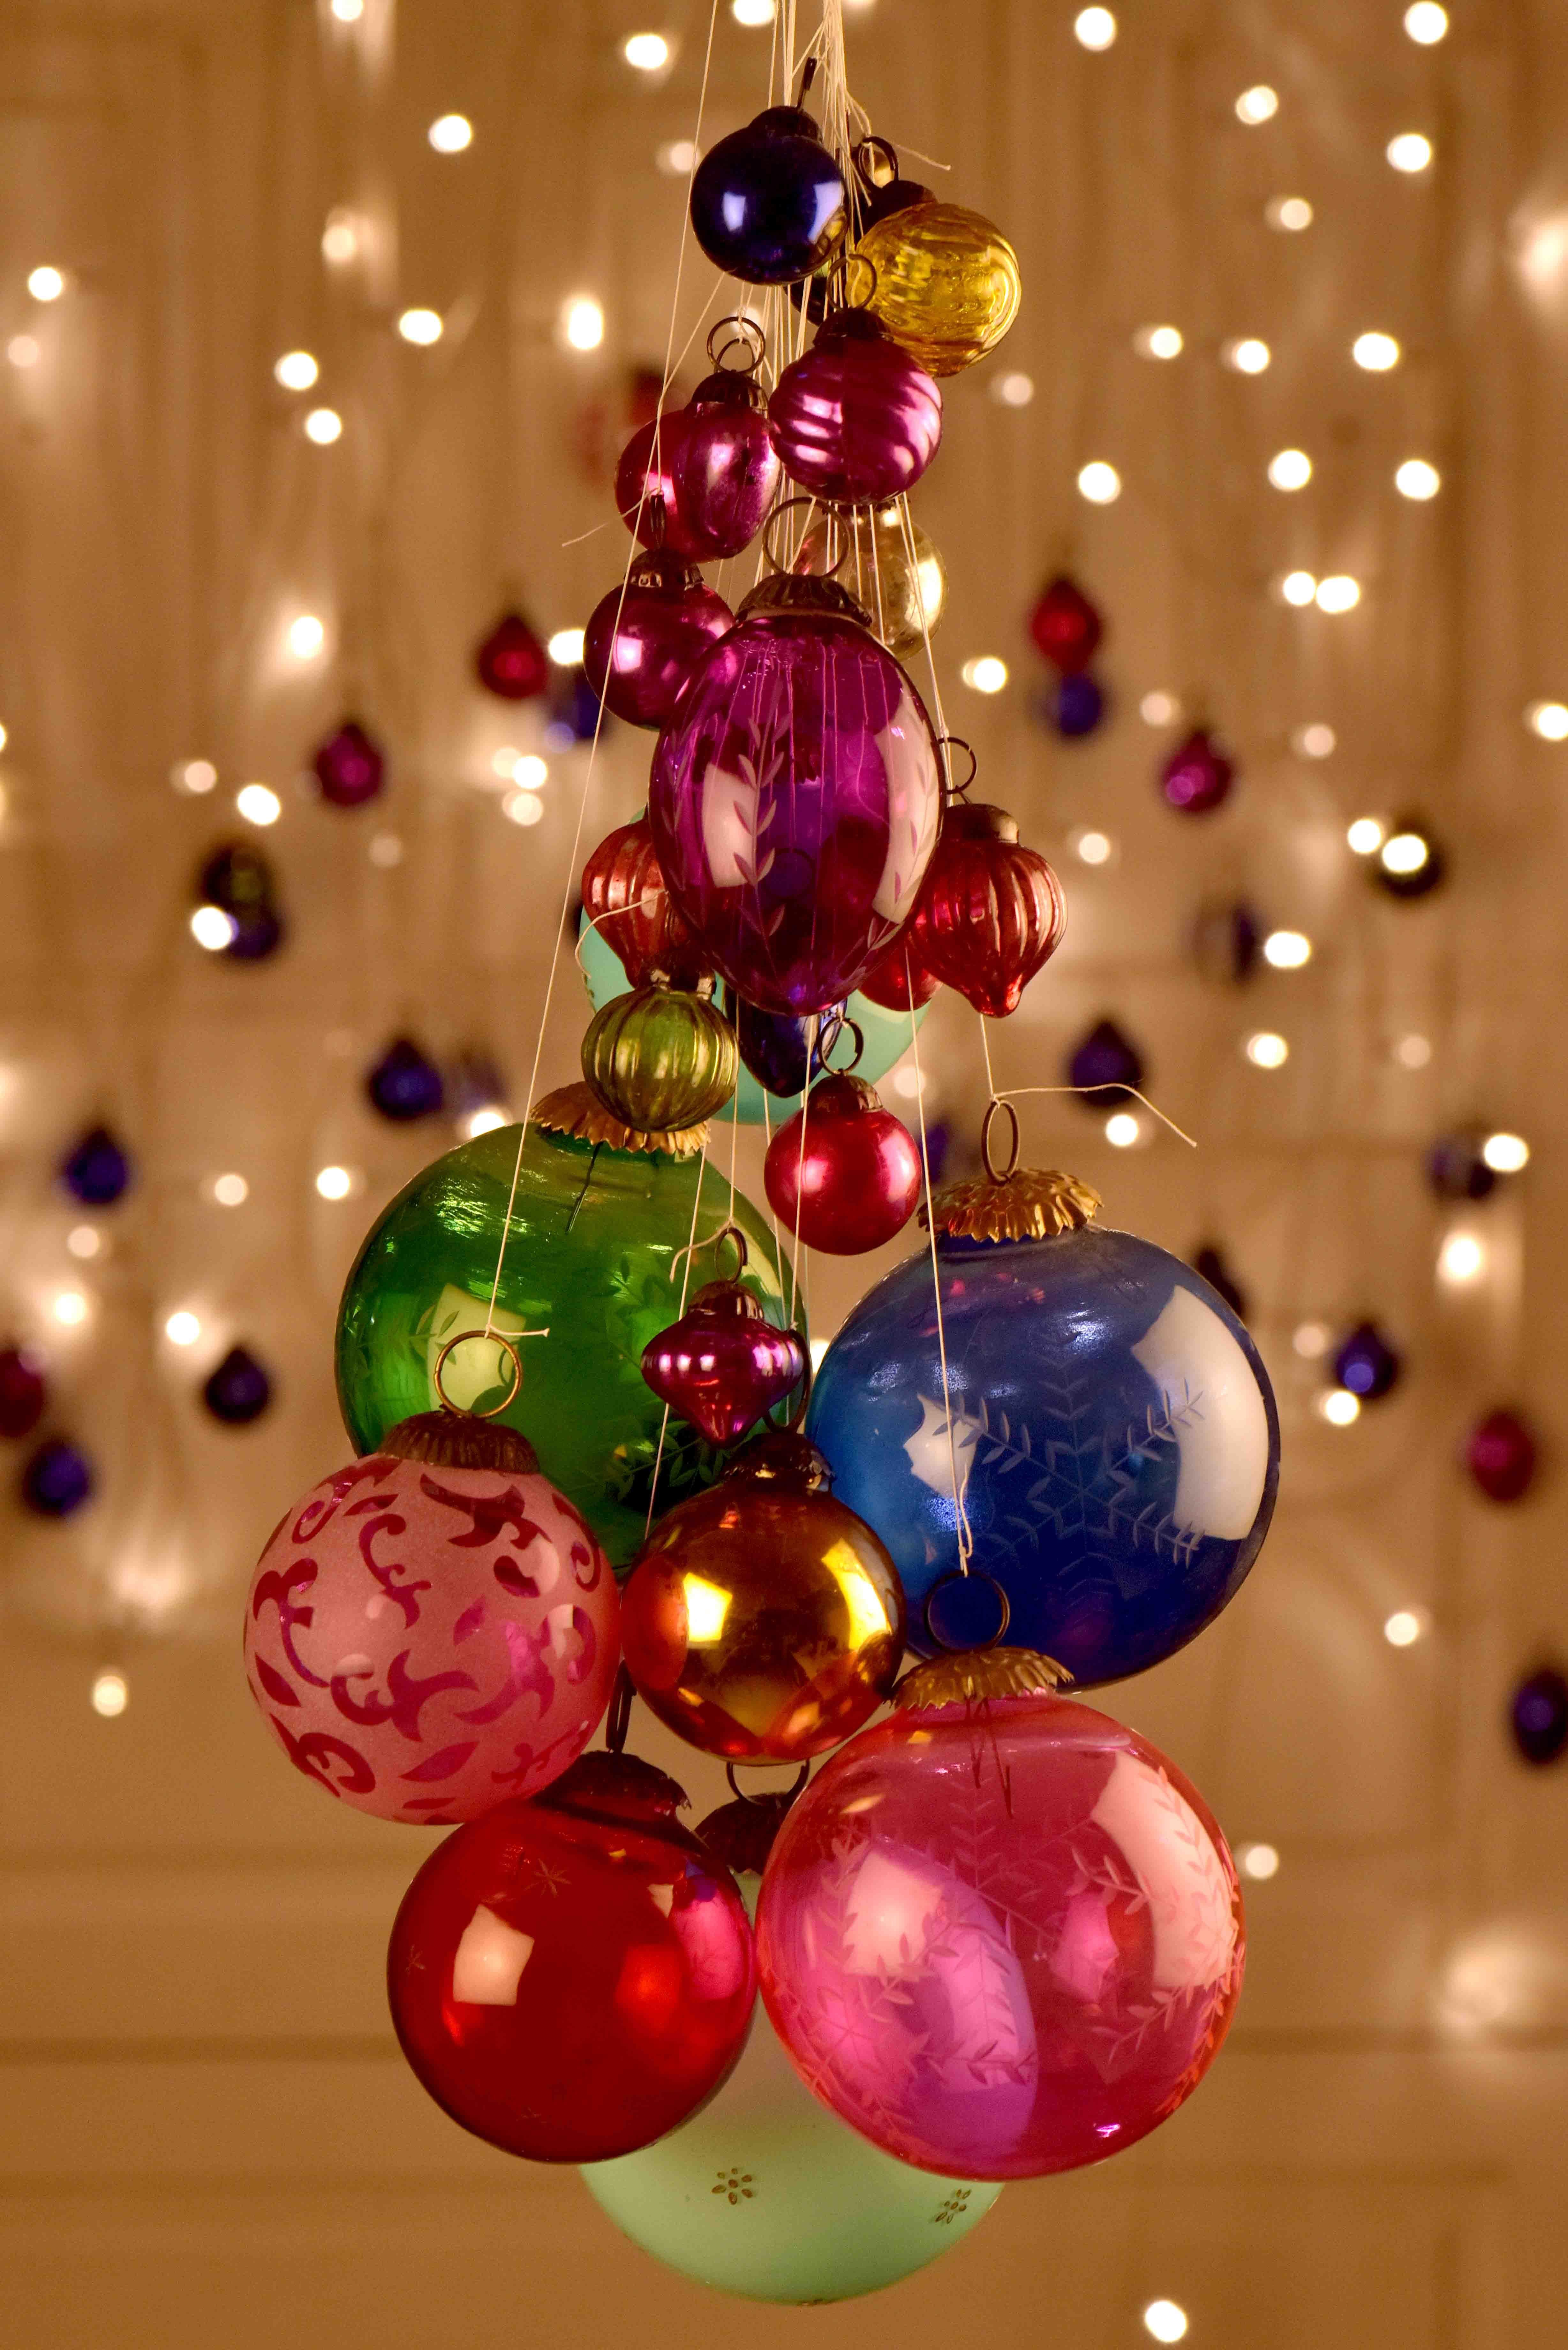 Christmas Ornaments Xmas Decorations Christmas Ornaments Christmas Tree Decorations